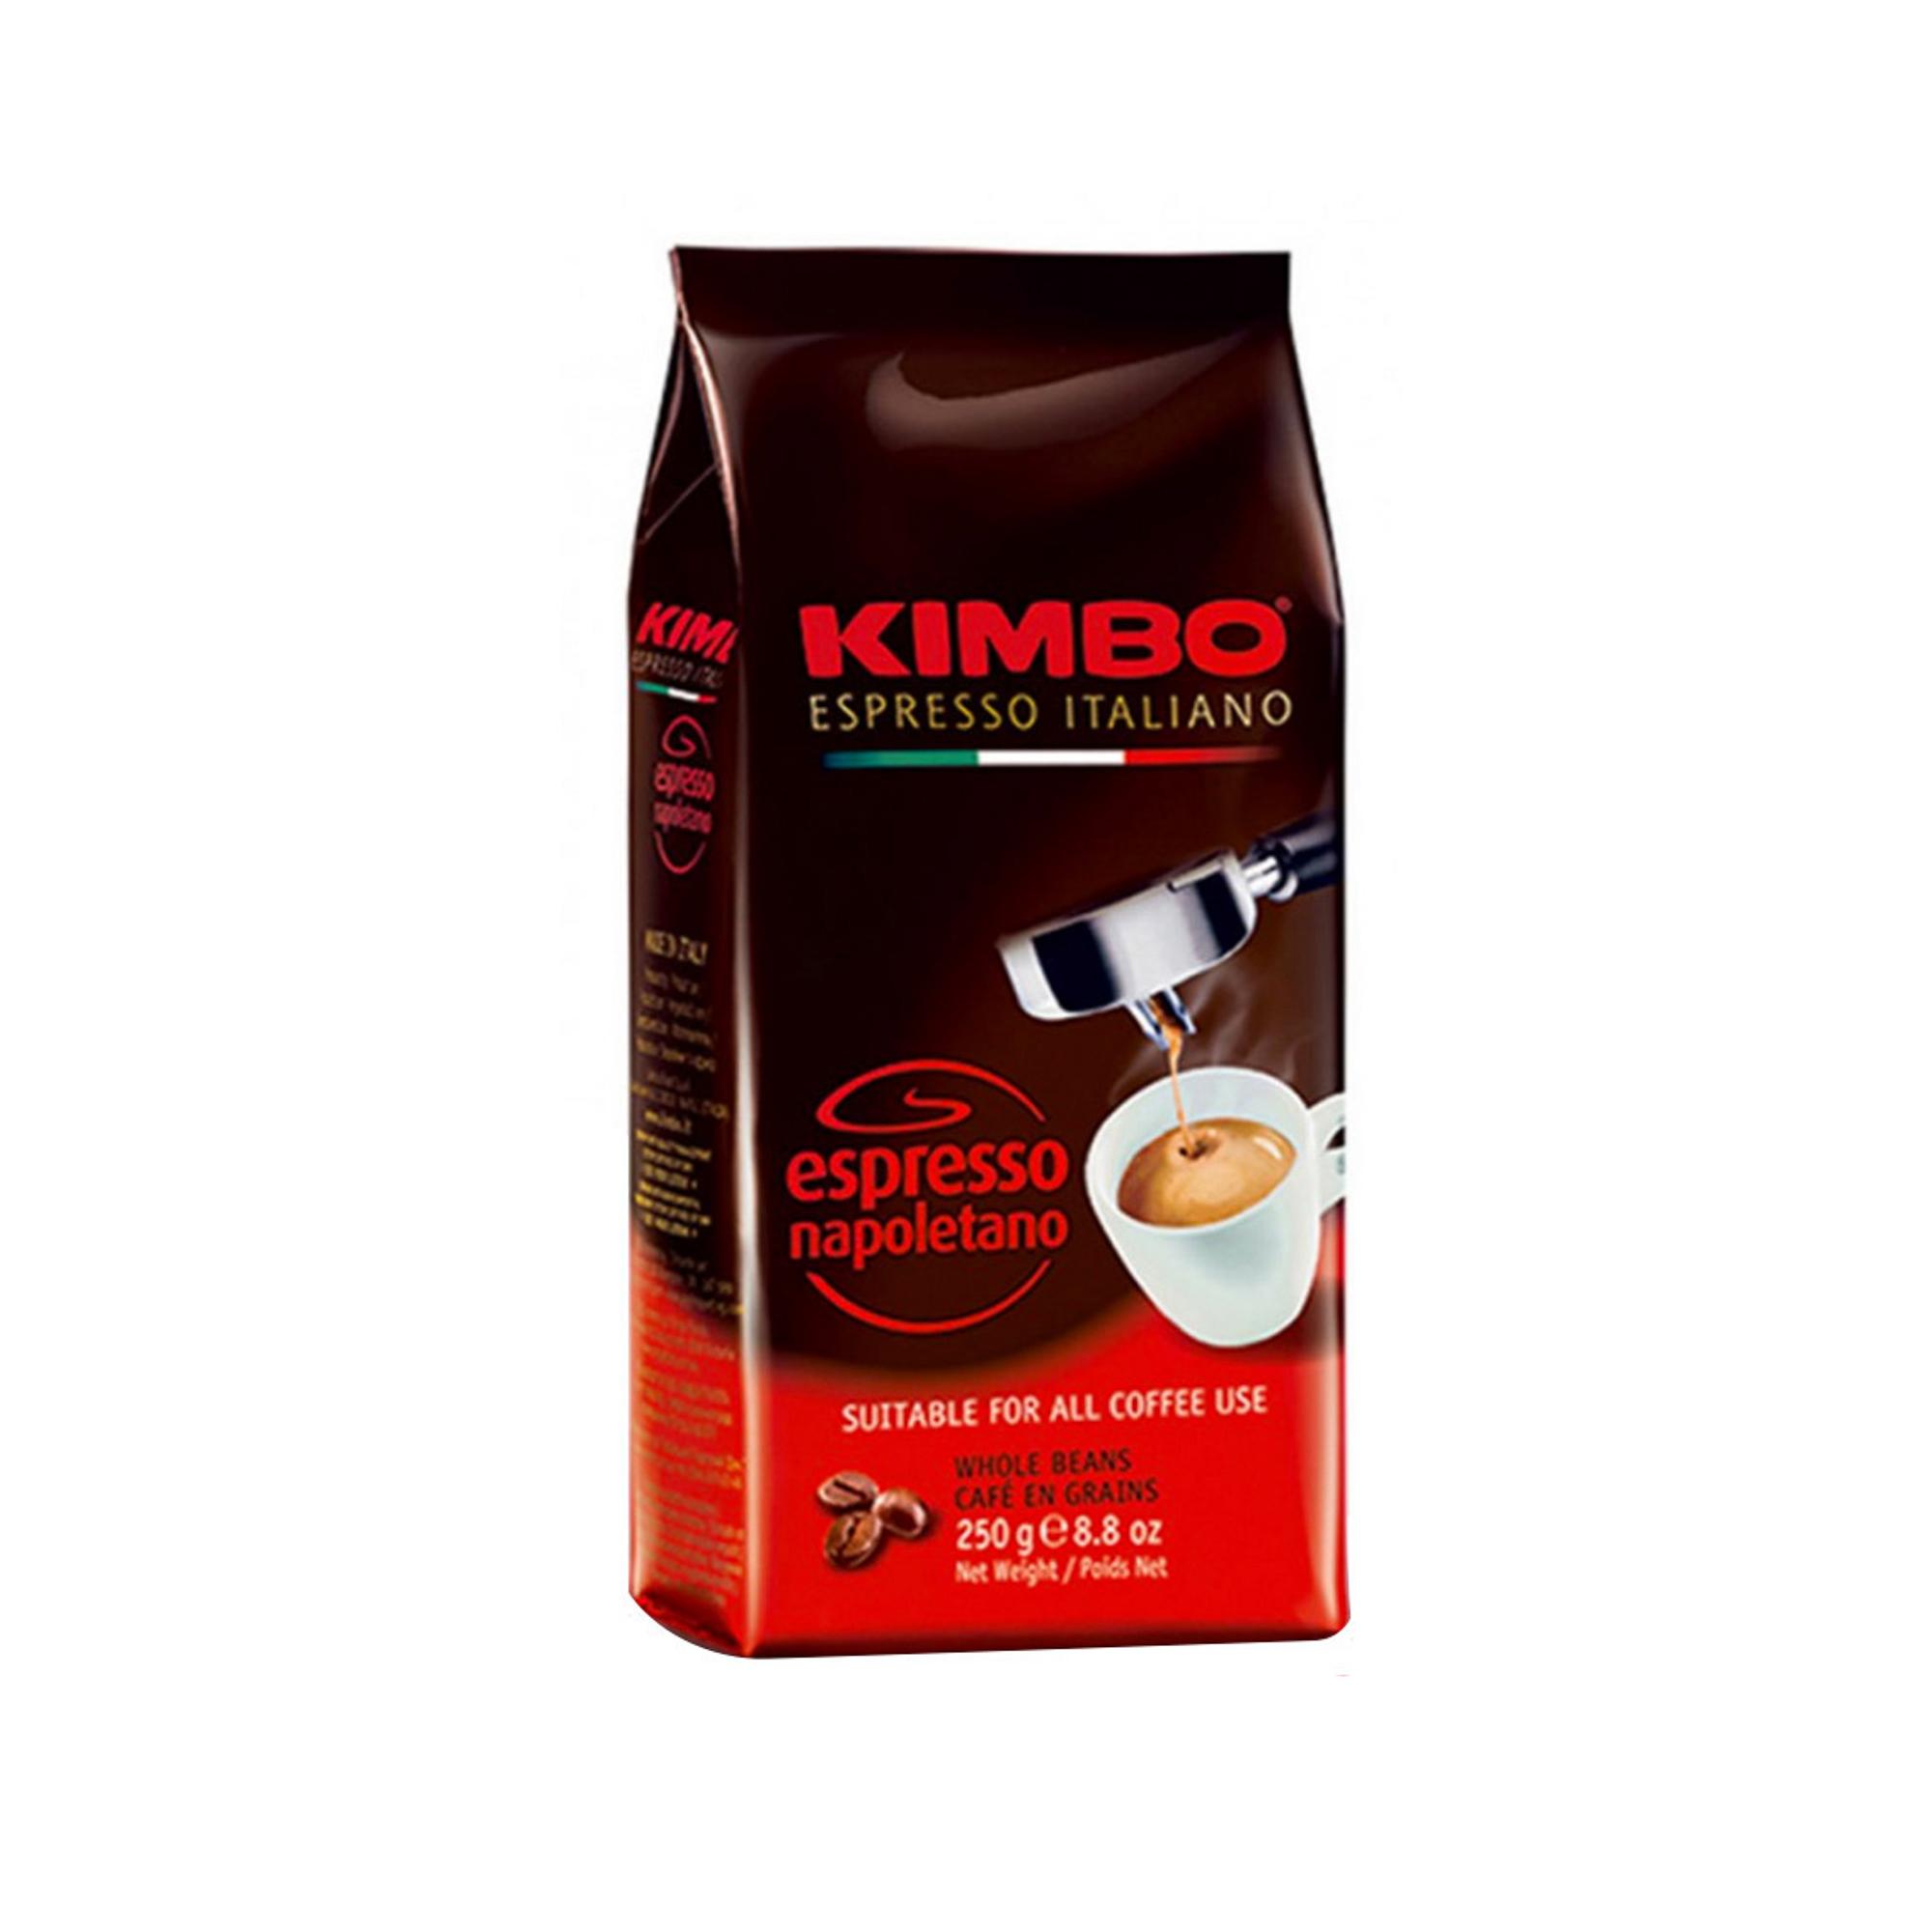 Кофе в зернах Kimbo Espresso Napoletano 250 г кофе в зернах kimbo espresso bar prestige 1000